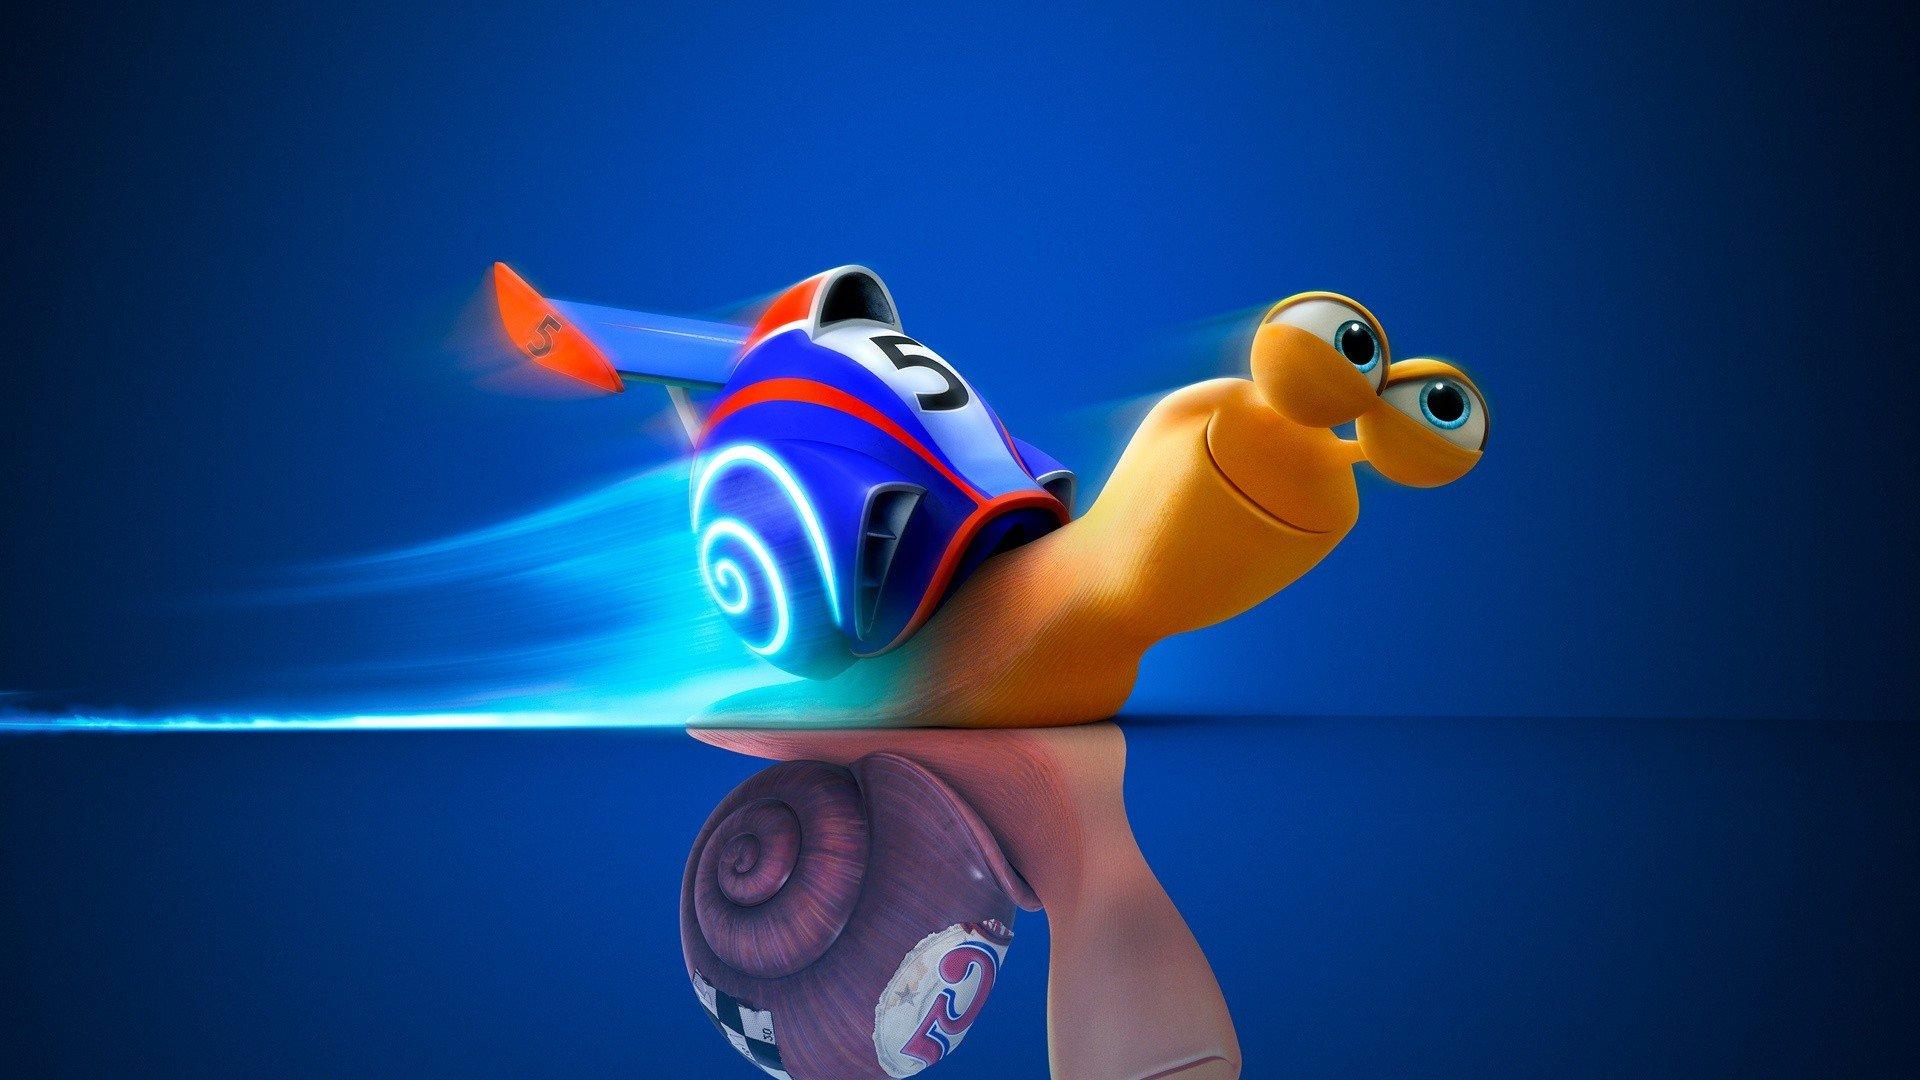 movies film animation speed wallpaper 1920x1080 255519